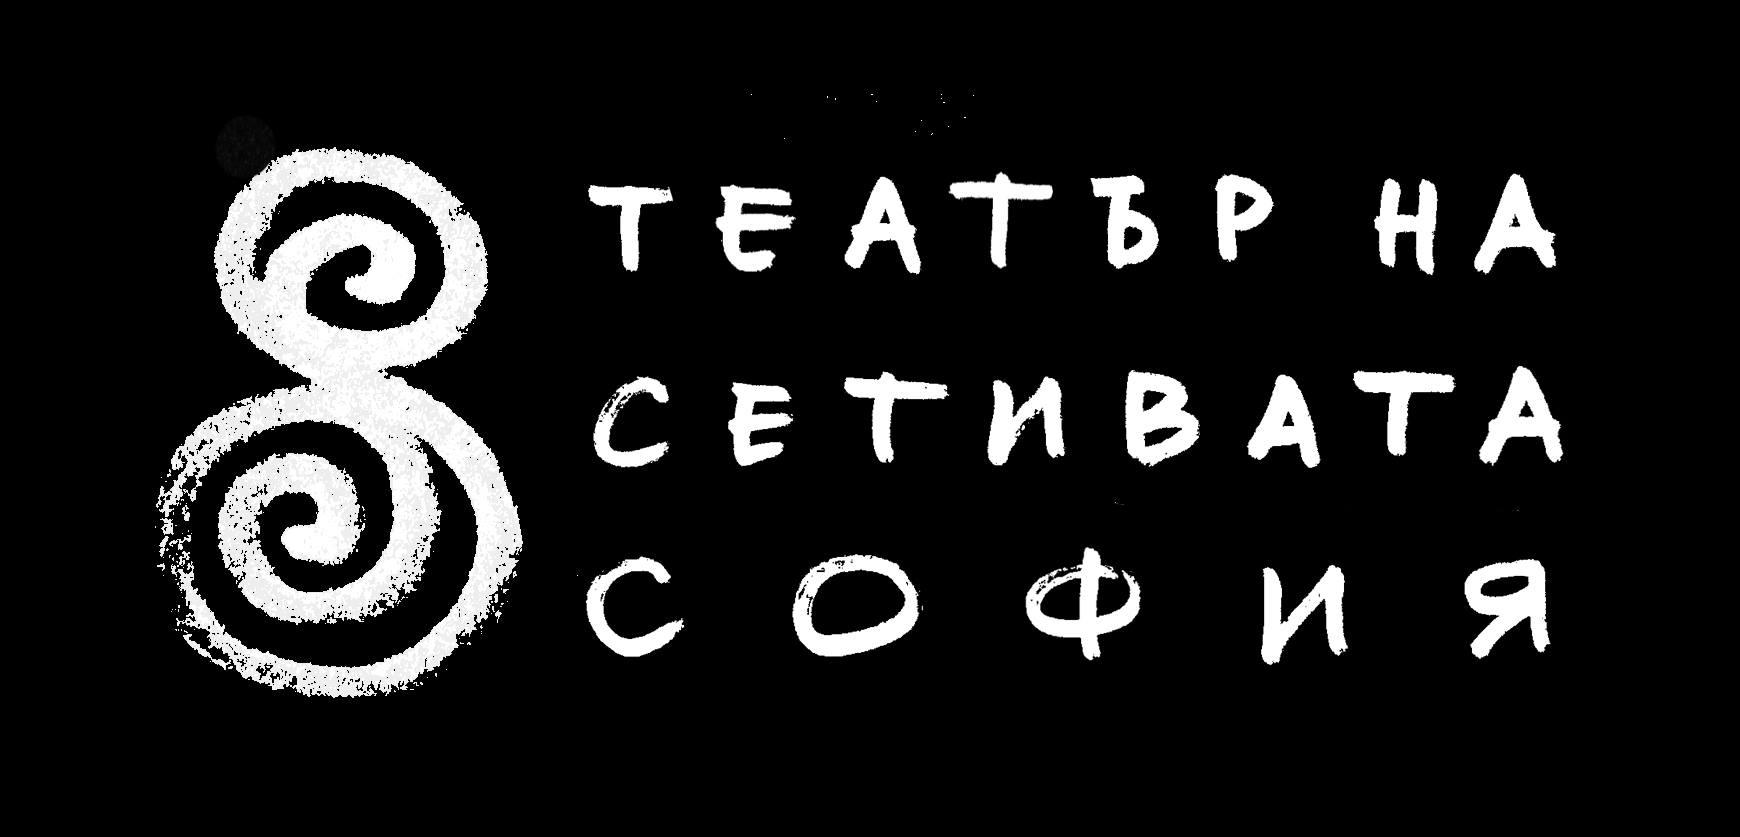 logo i nadpis